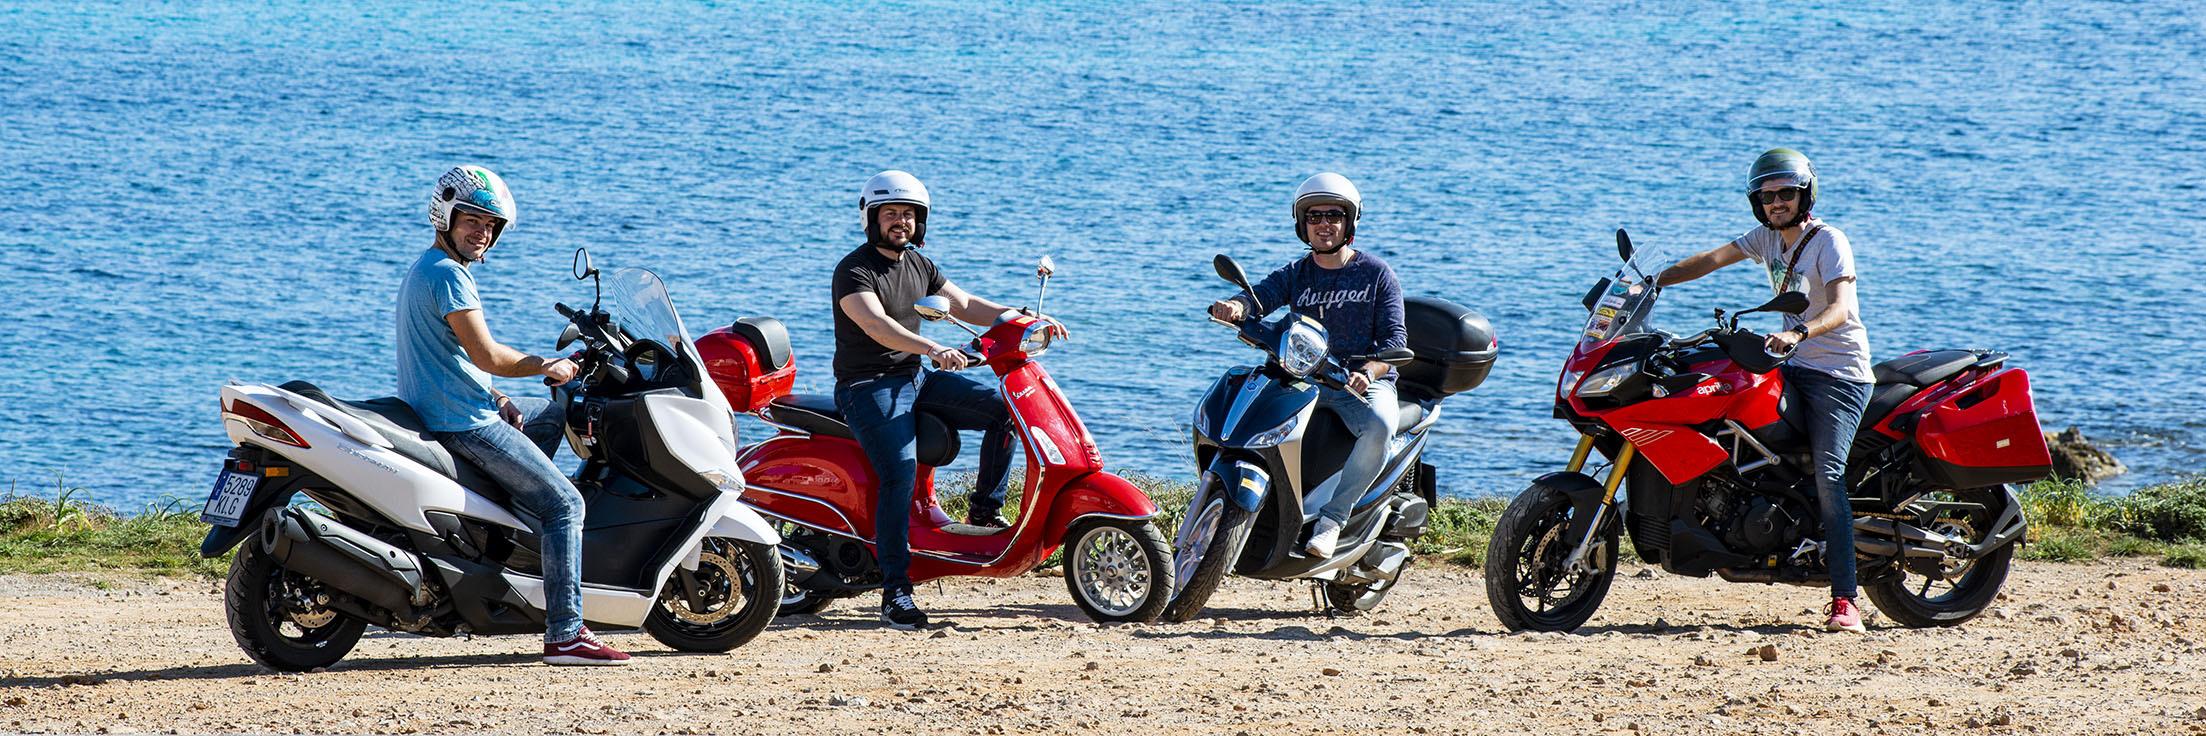 Schulz Rent A Bike auf Mallorca